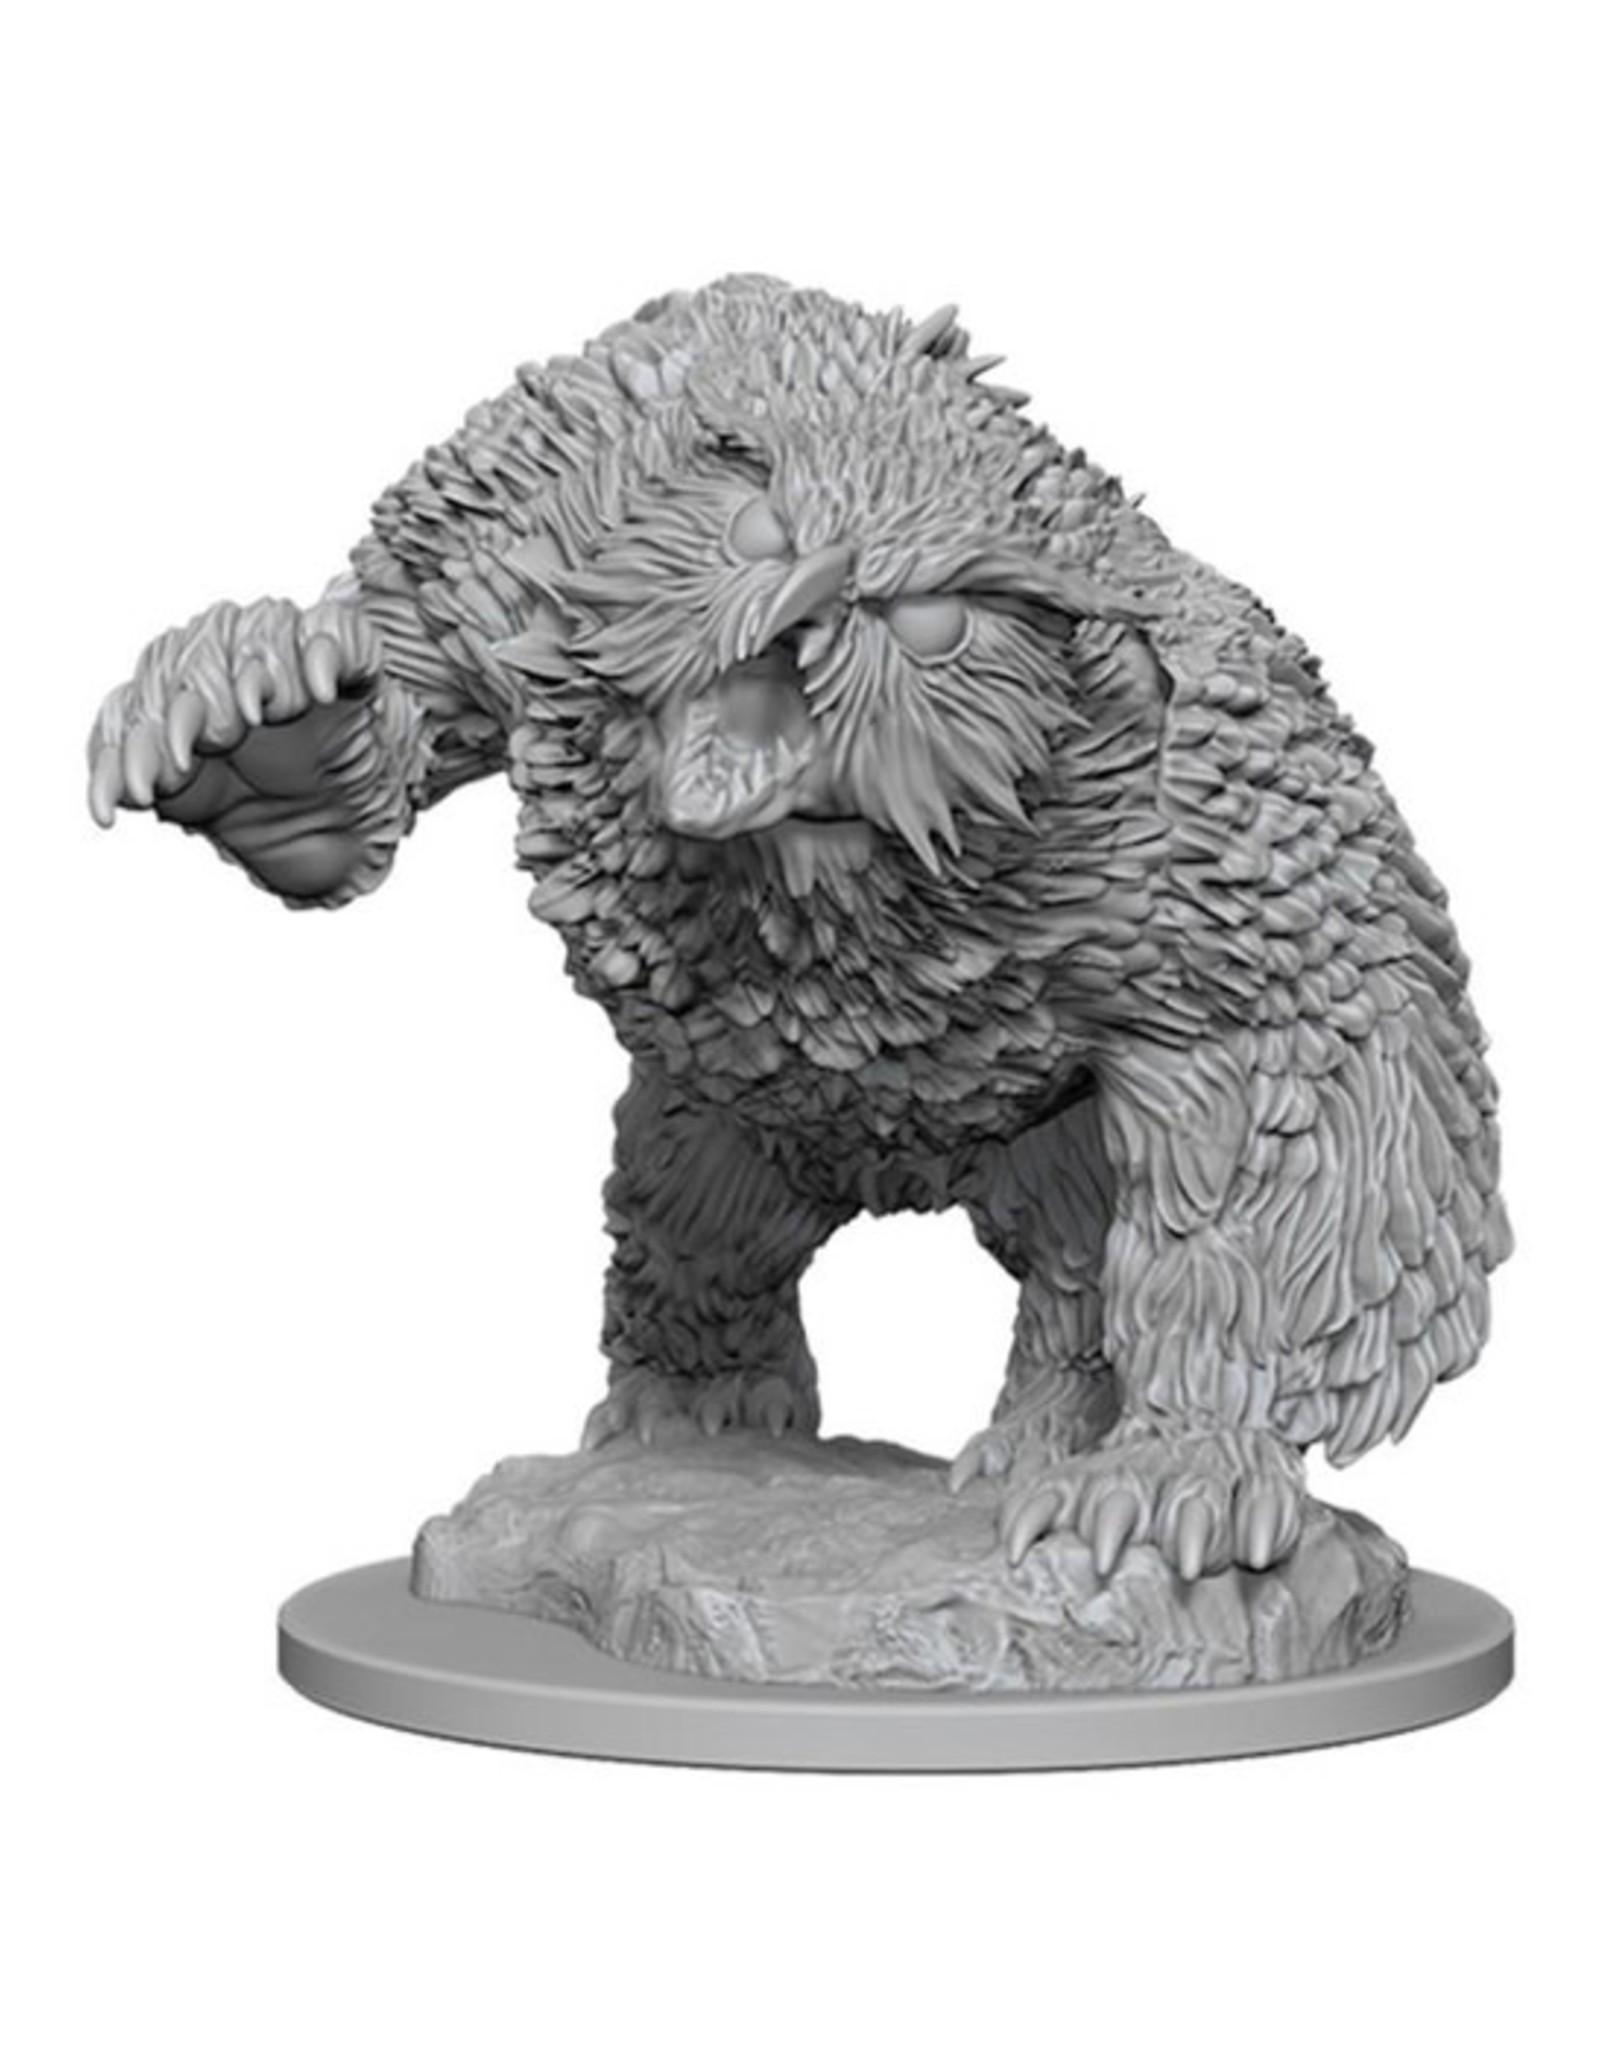 Dungeons & Dragons Dungeons & Dragons: Nolzur's - Owlbear